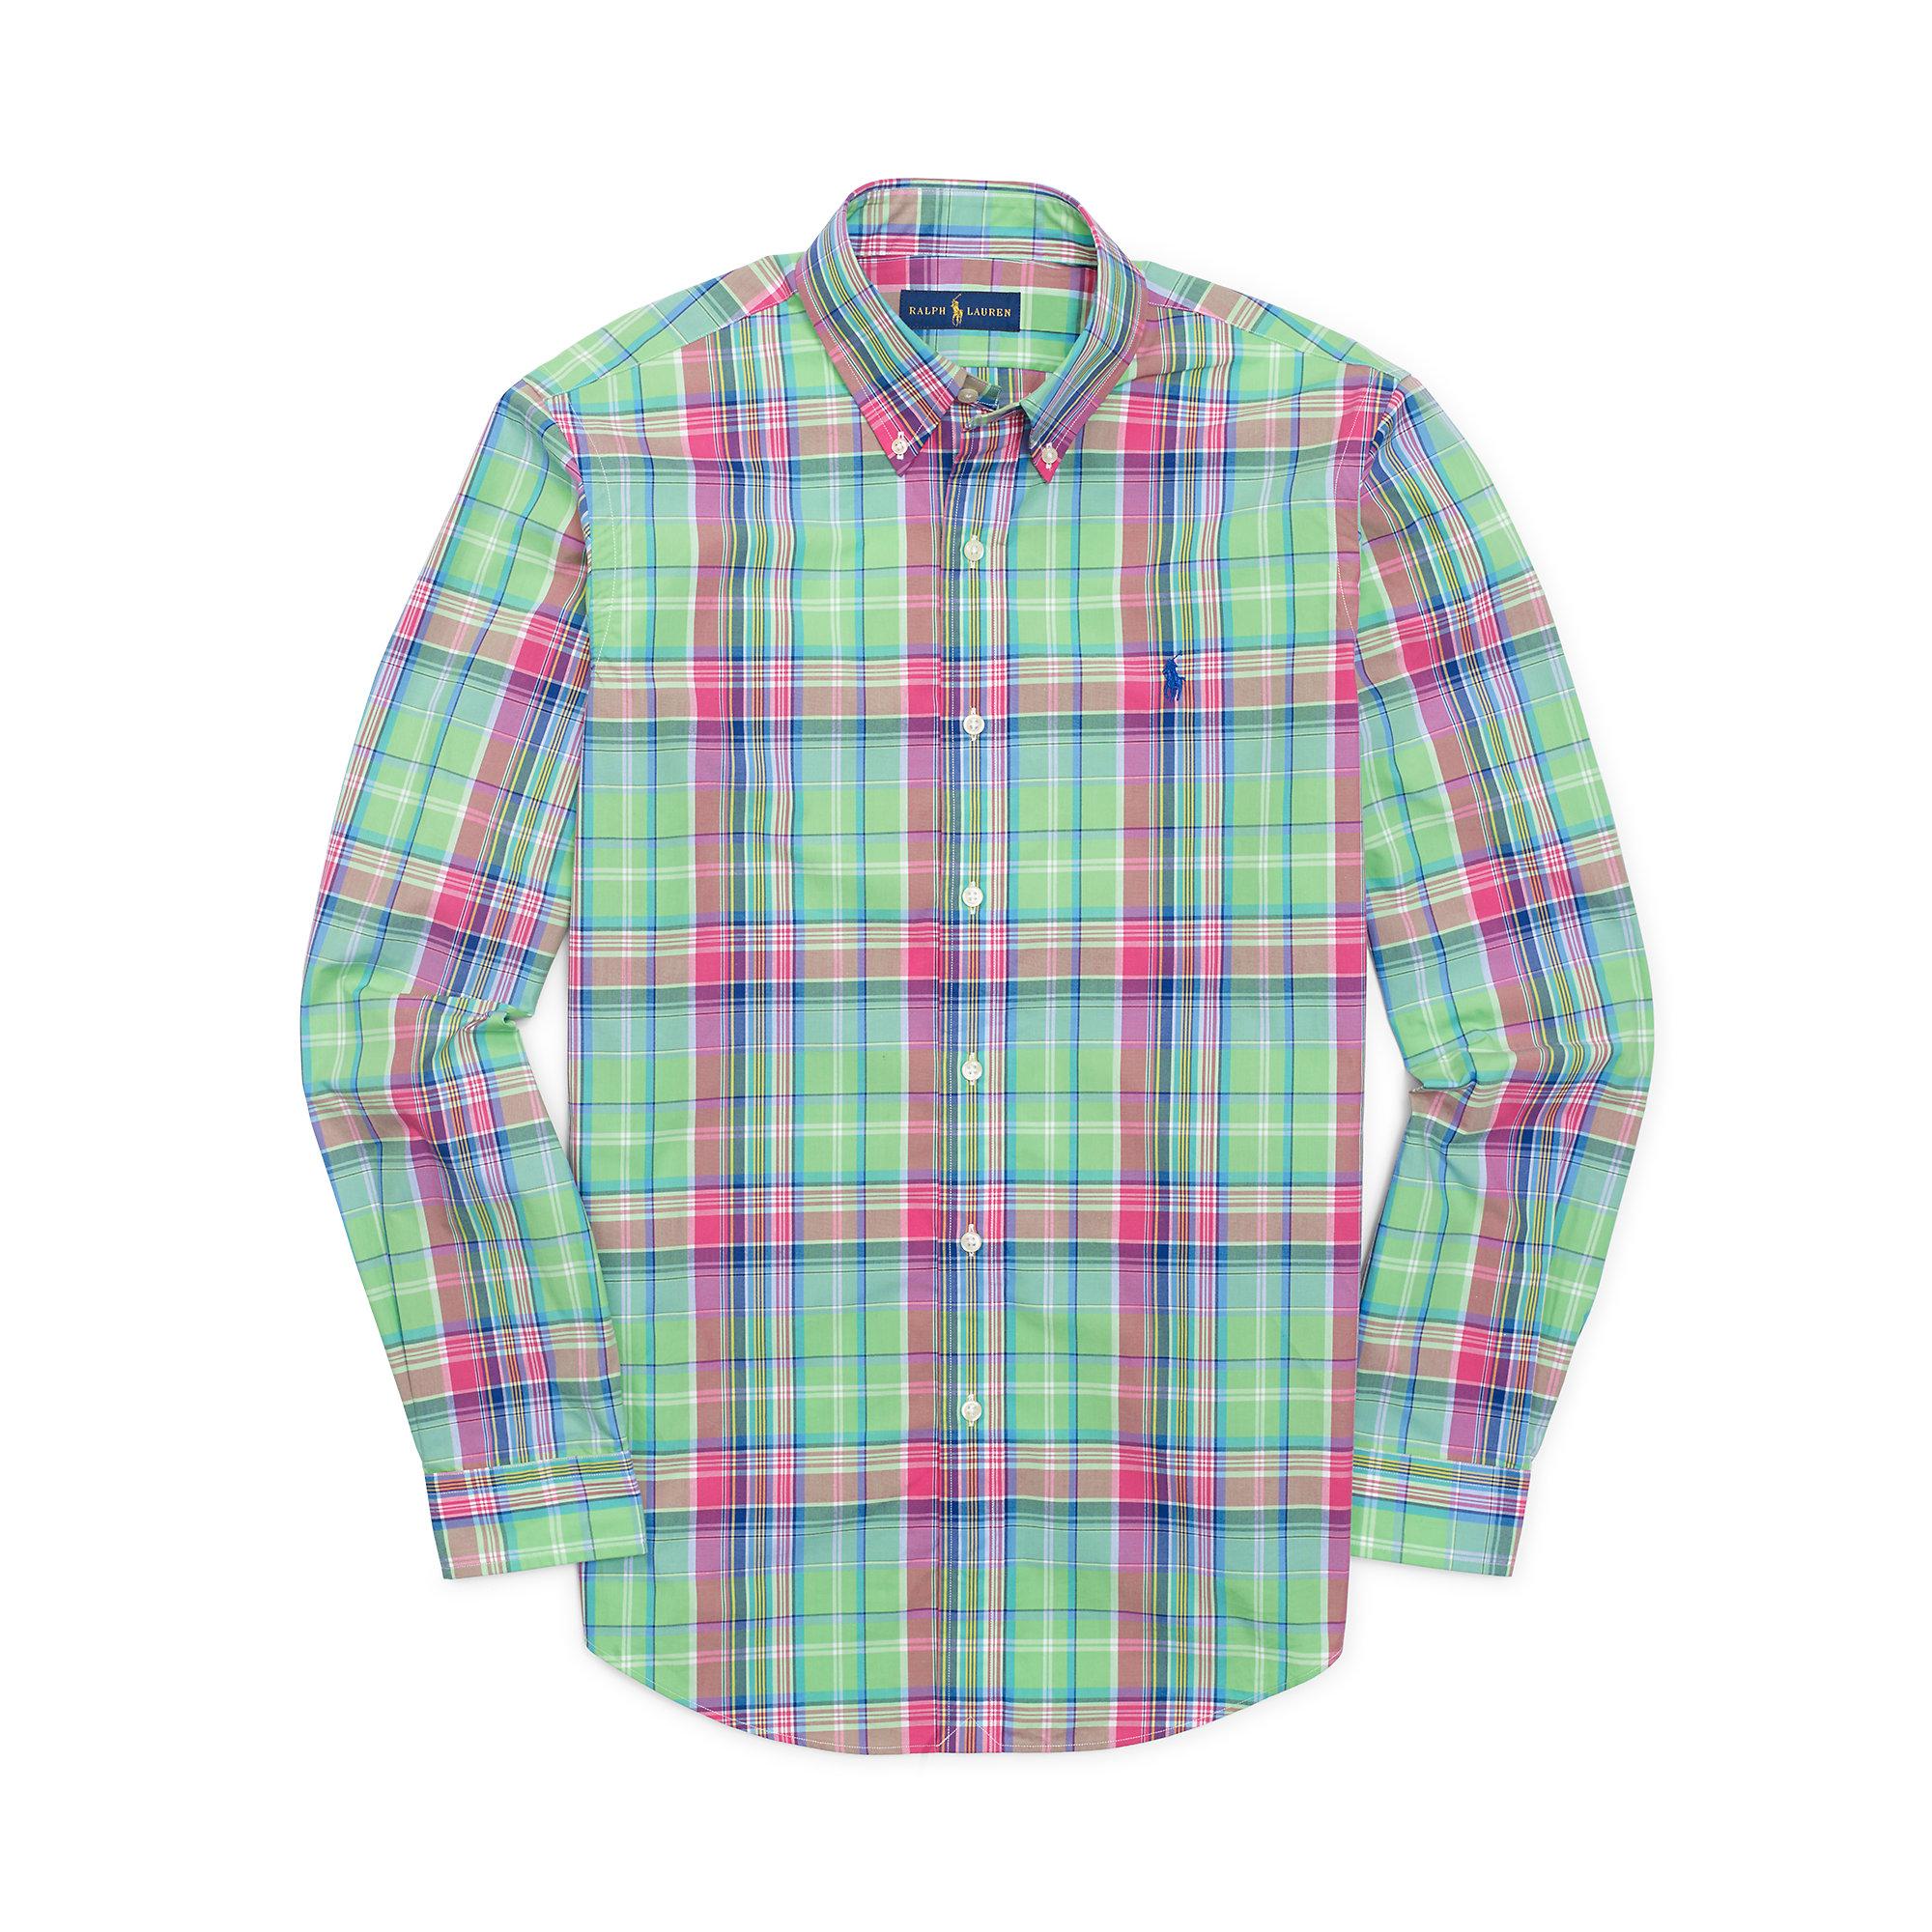 polo ralph lauren plaid cotton poplin shirt for men lyst. Black Bedroom Furniture Sets. Home Design Ideas